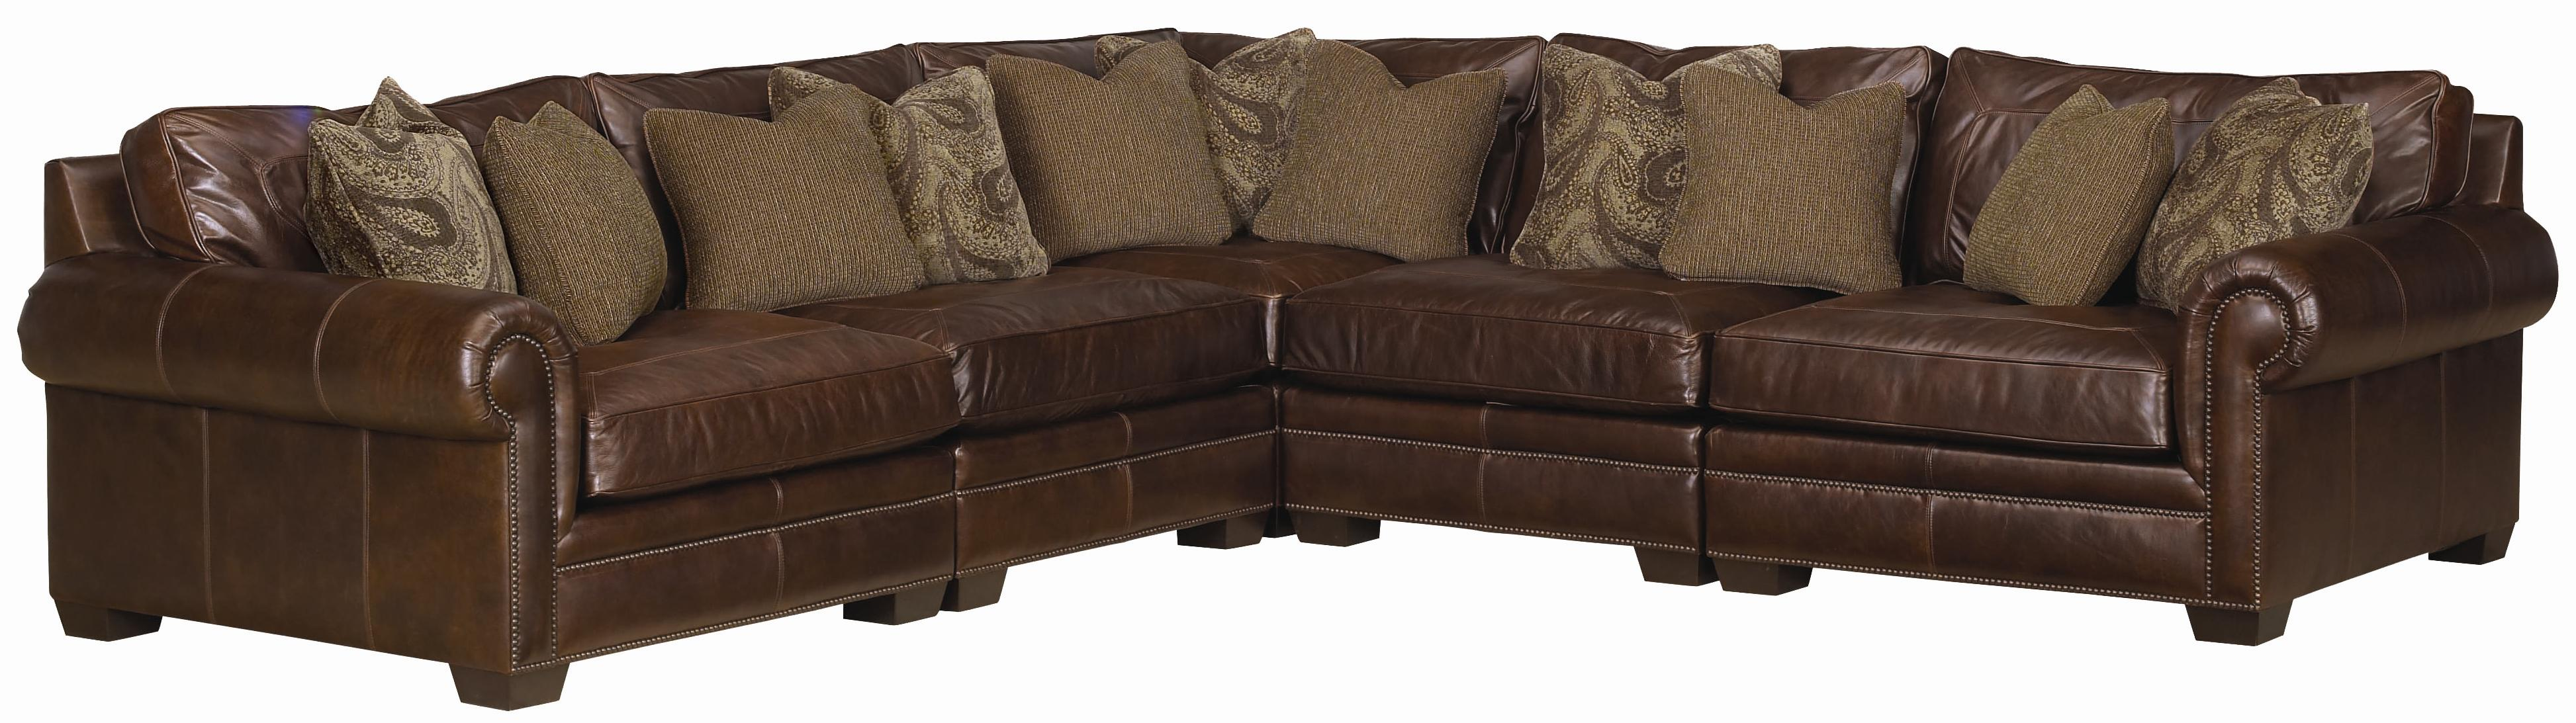 Bernhardt Grandview 5 Piece Traditional Sectional Sofa Dream Home Furniture Sectional Sofas